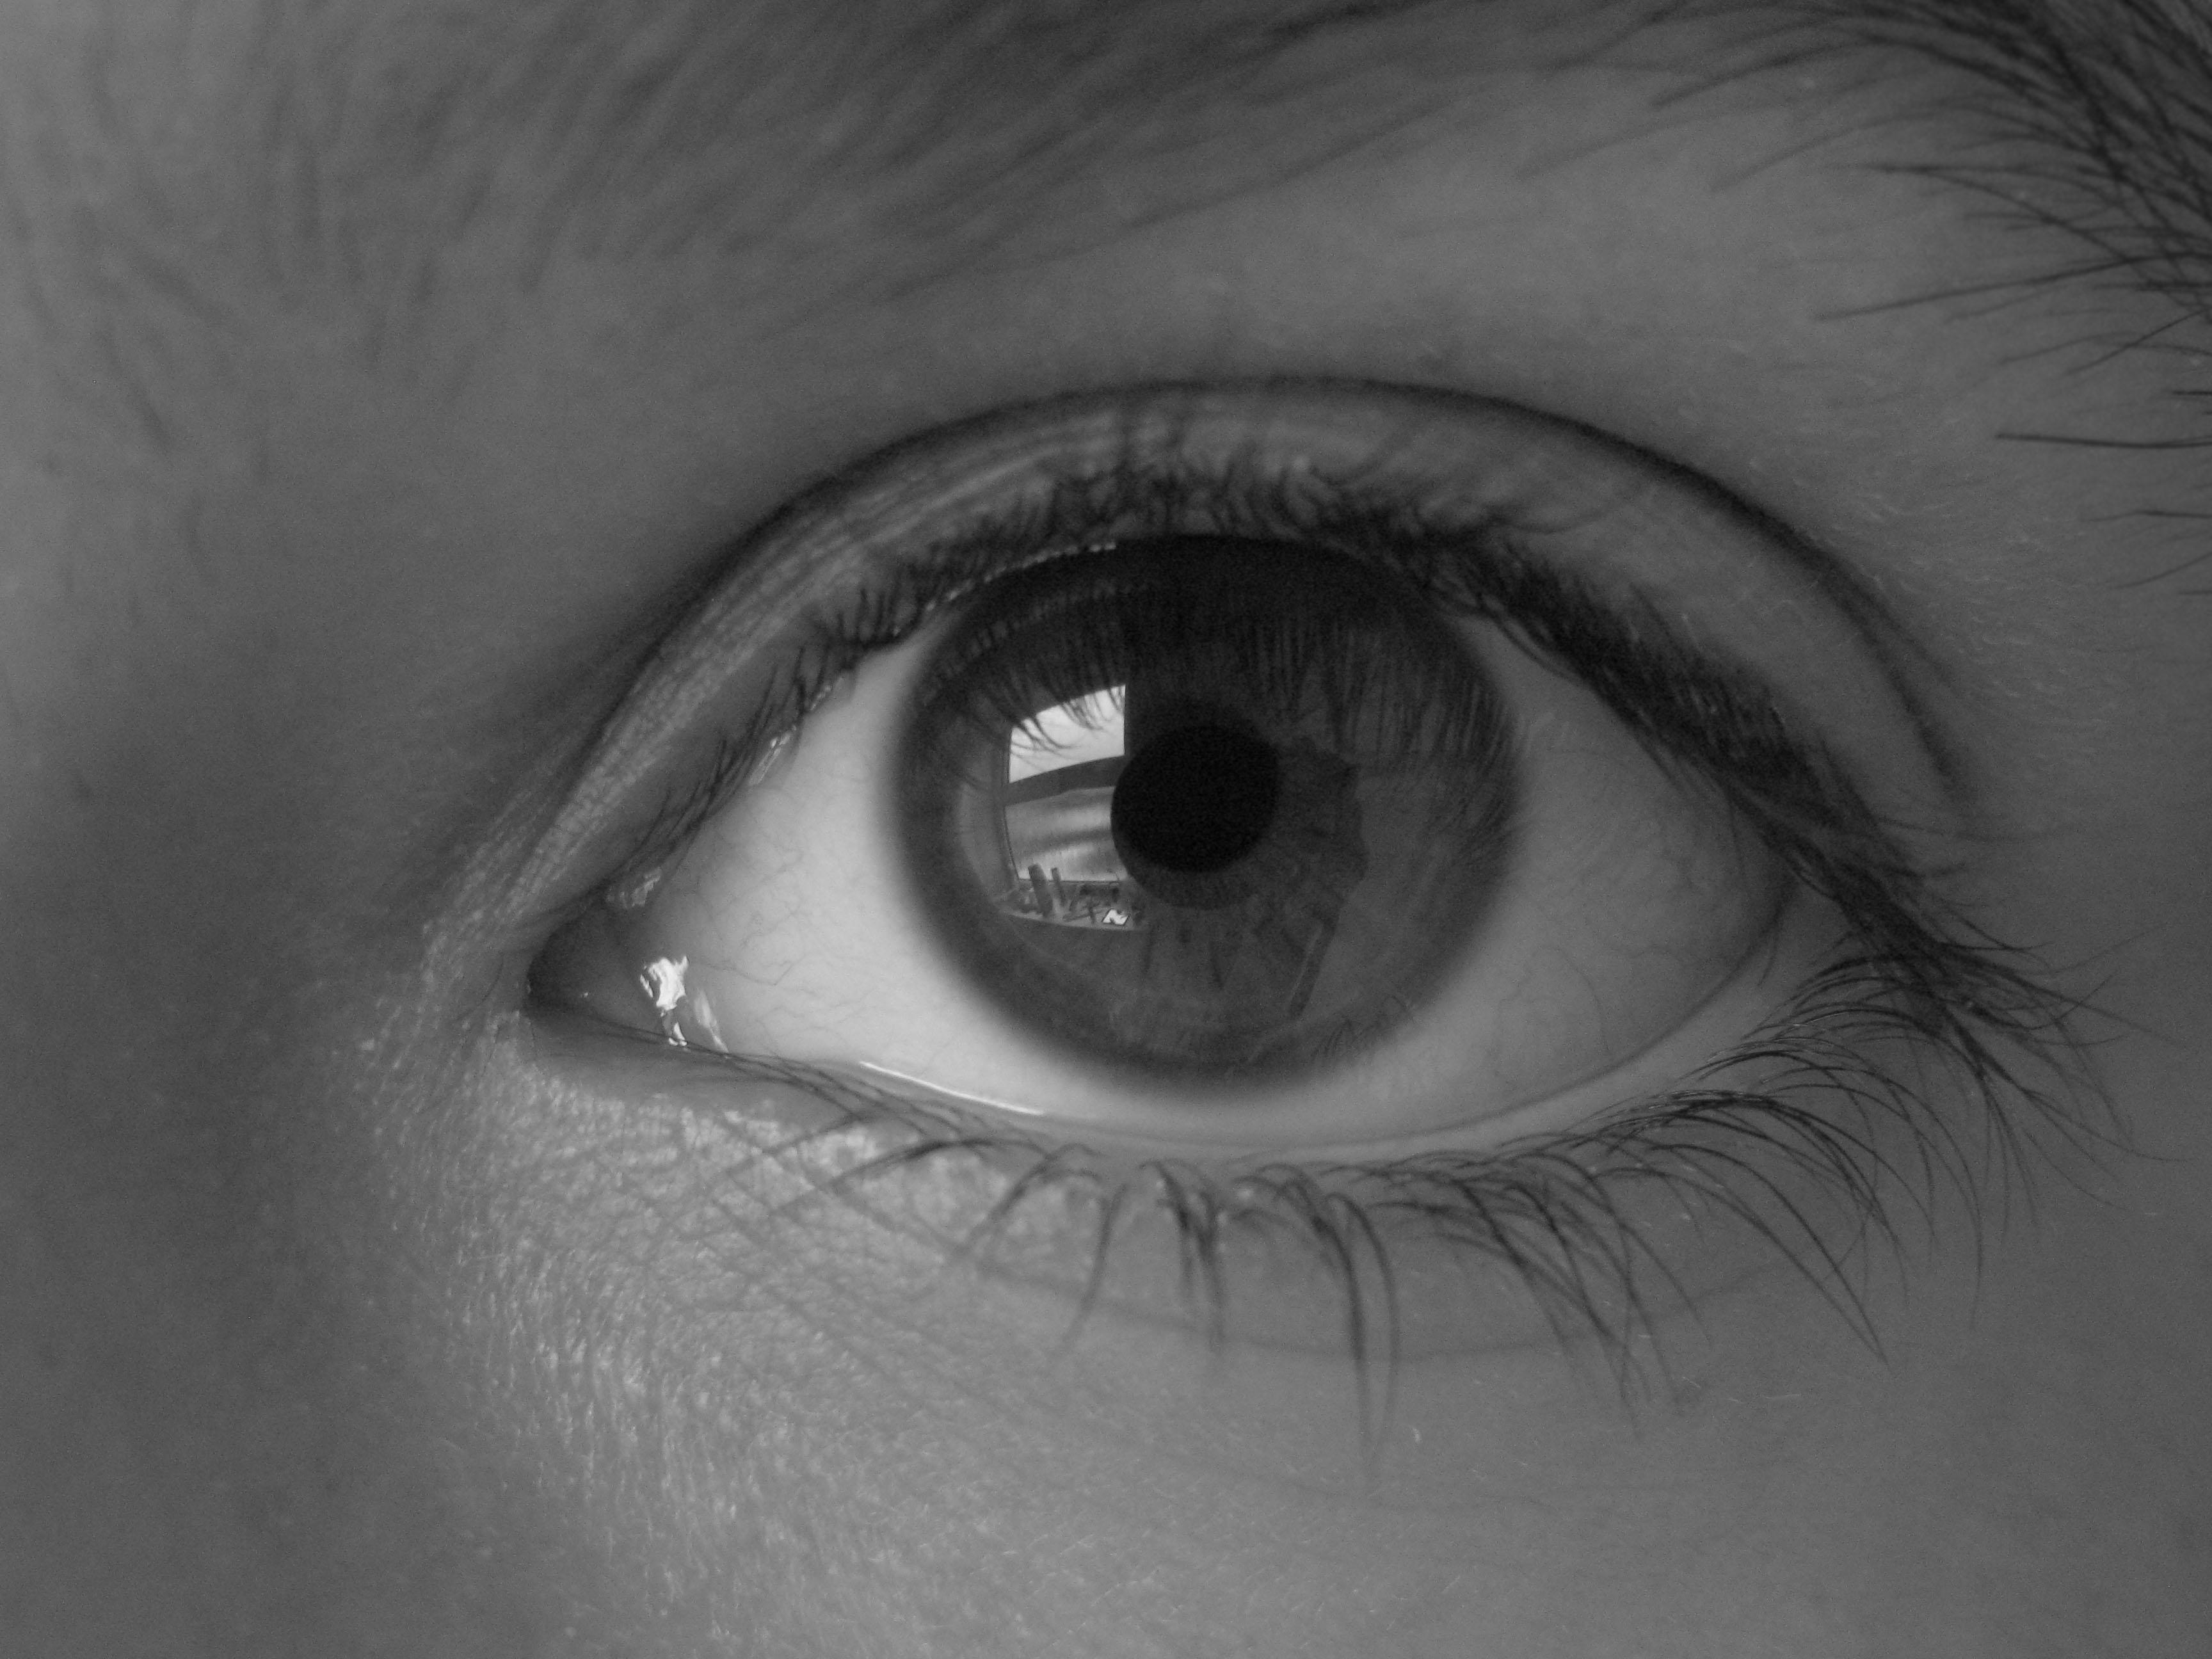 White eye